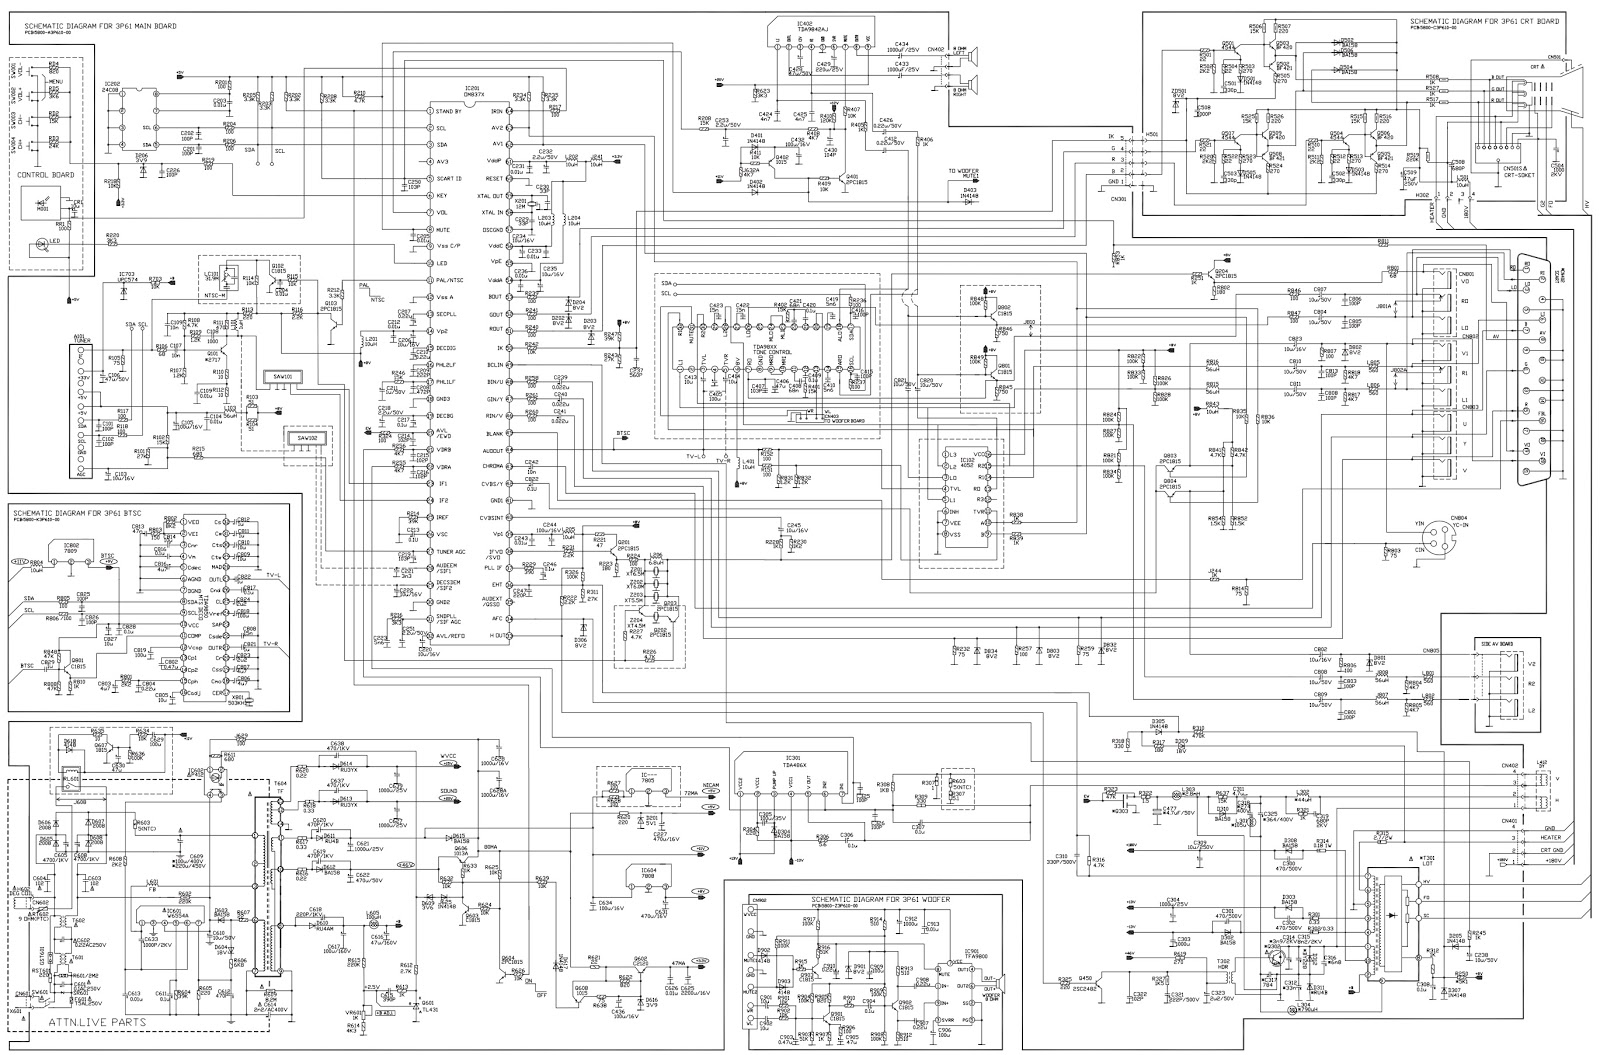 jvc samsung crt tv schematic diagram circuit and wiring diagram schematic diagram for samsing slim crt [ 1600 x 1055 Pixel ]